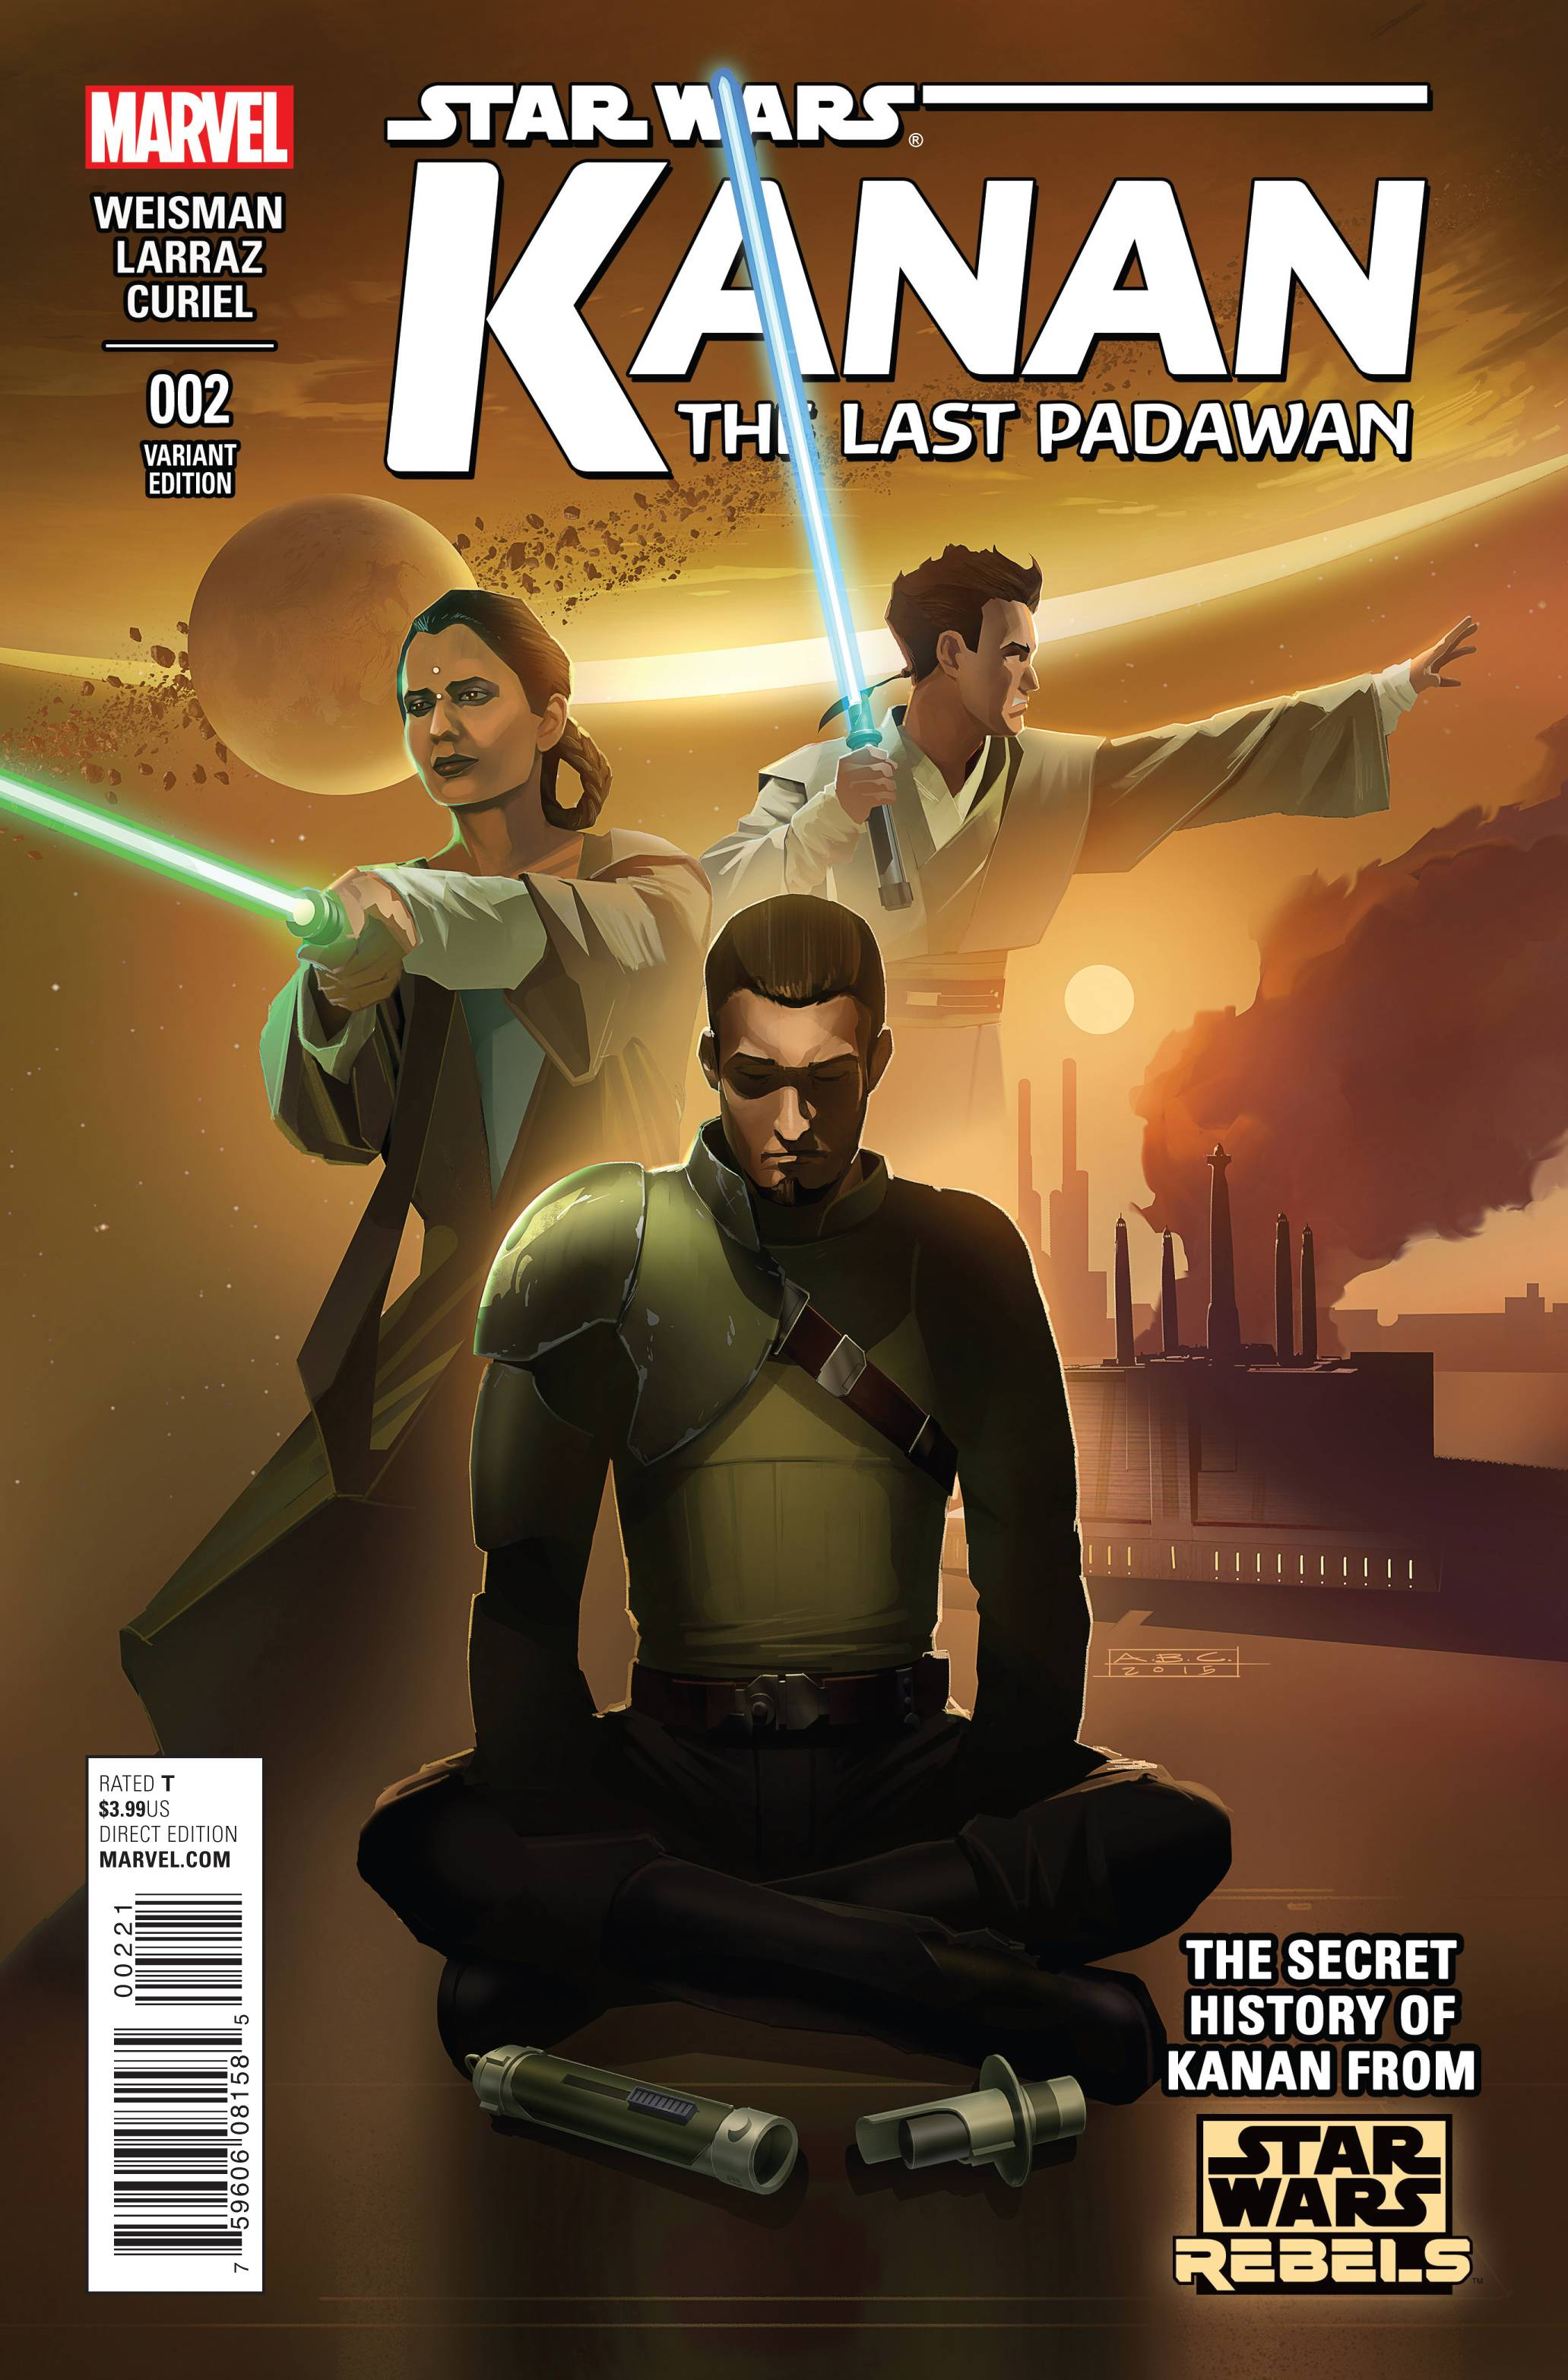 Kanan: The Last Padawan #2 (Amy Beth Christenson Variant Cover) (06.05.2015)